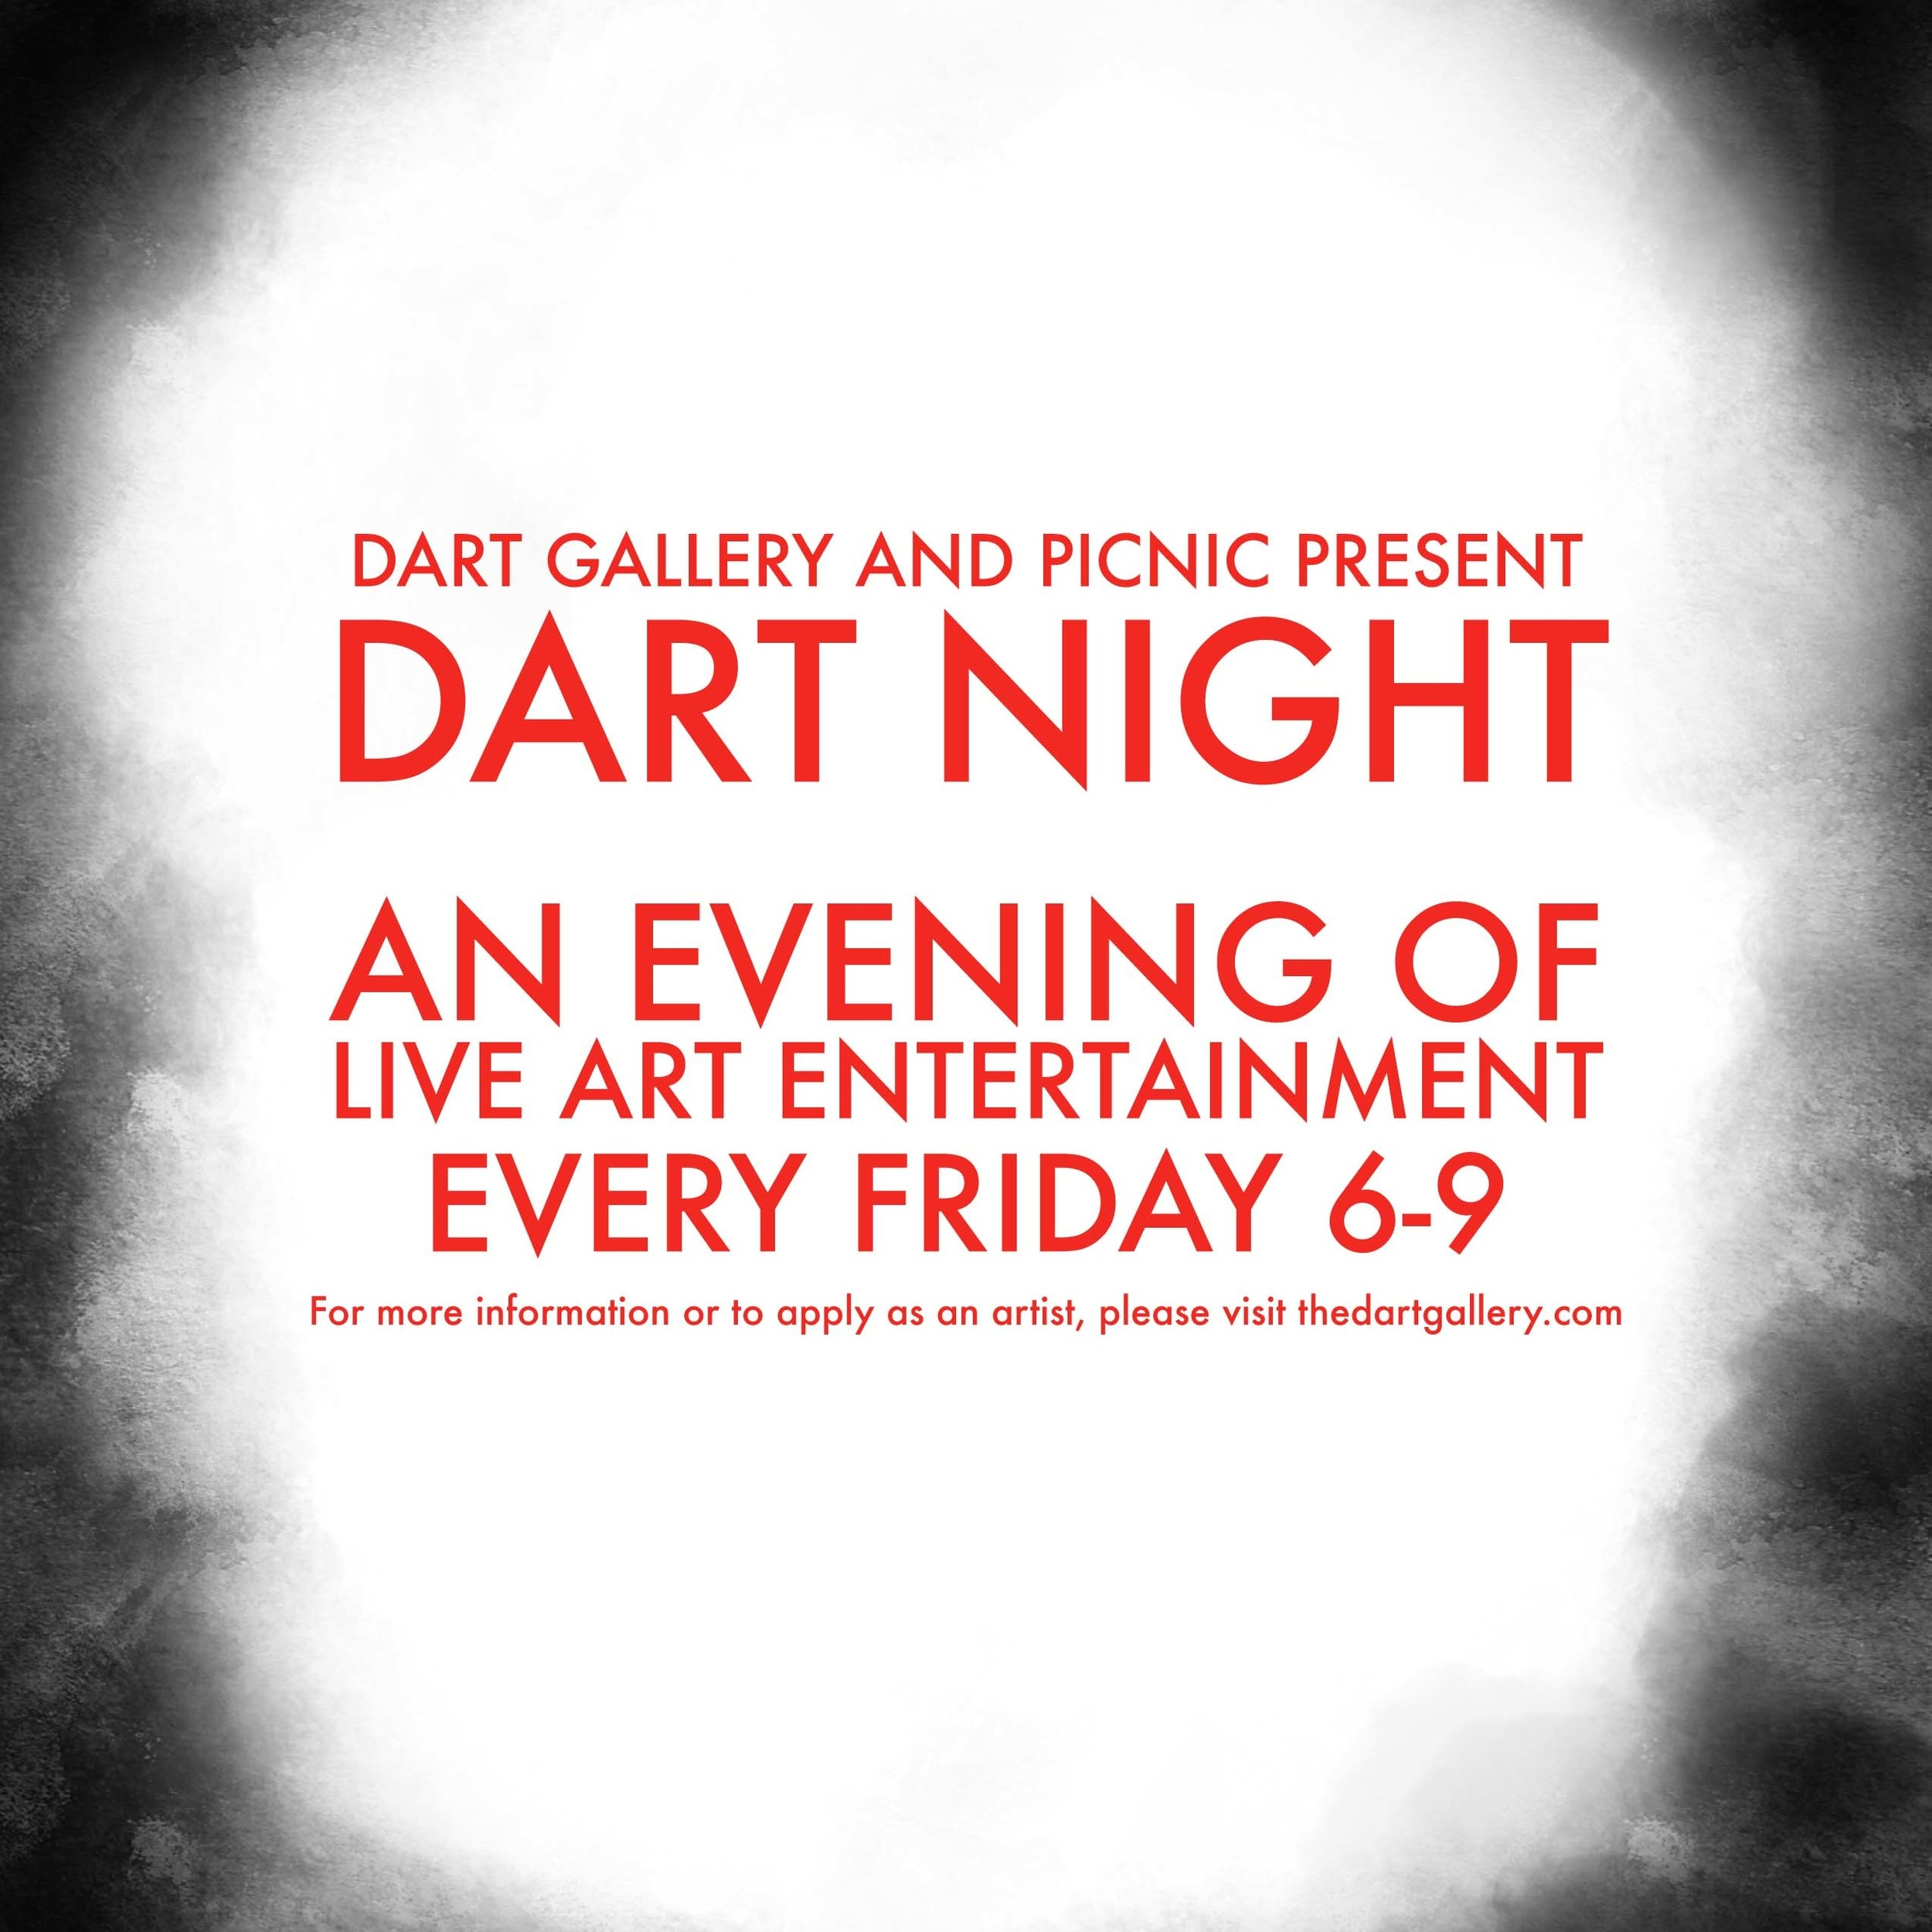 Dart night poster edit - GOOD.jpg